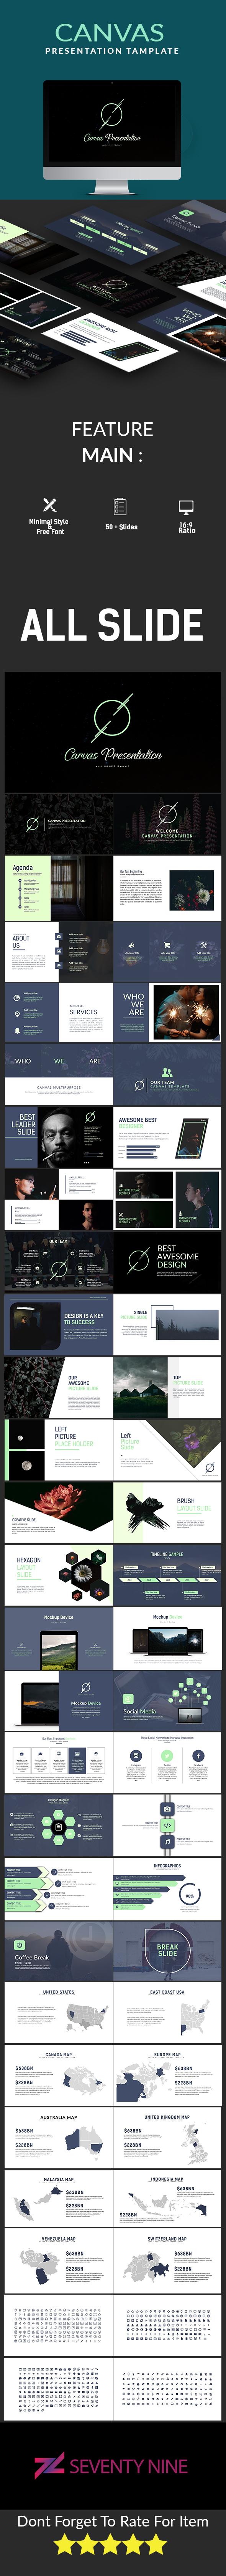 Canvas Multipurpose Keynote Template - Keynote Templates Presentation Templates